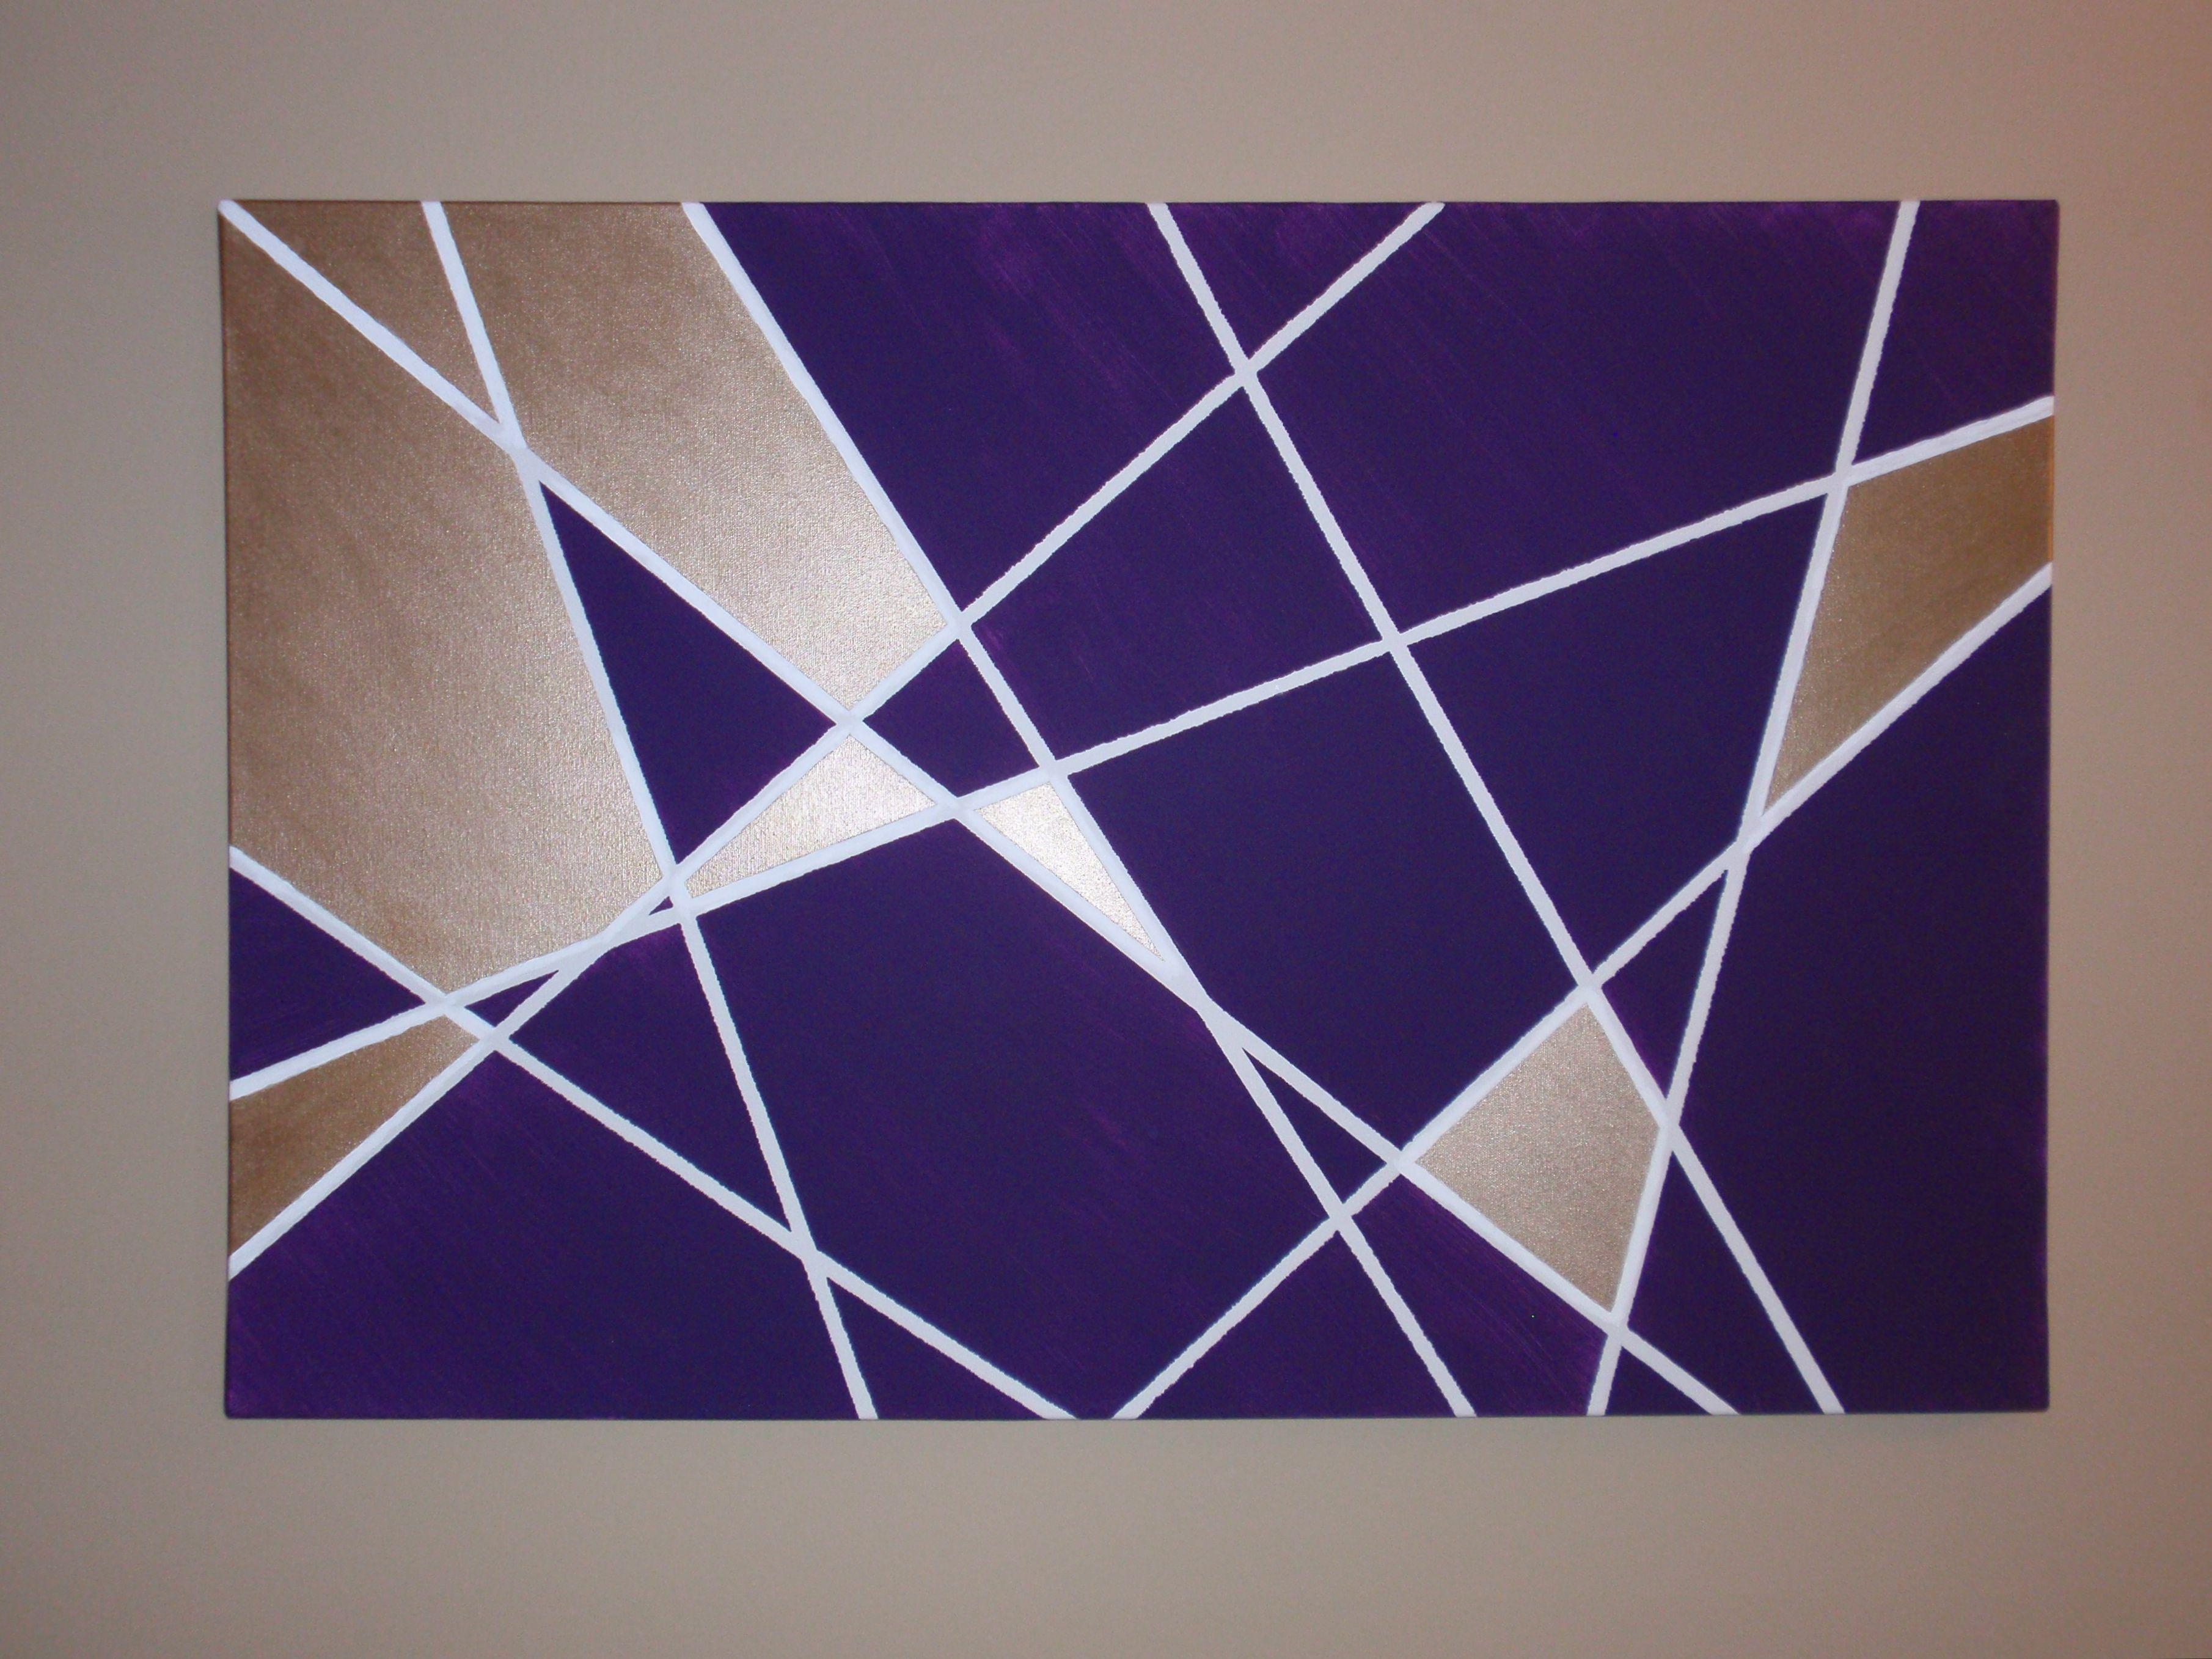 Wall Art Diy geometric wall art diy   geometric wall art, geometric wall and walls